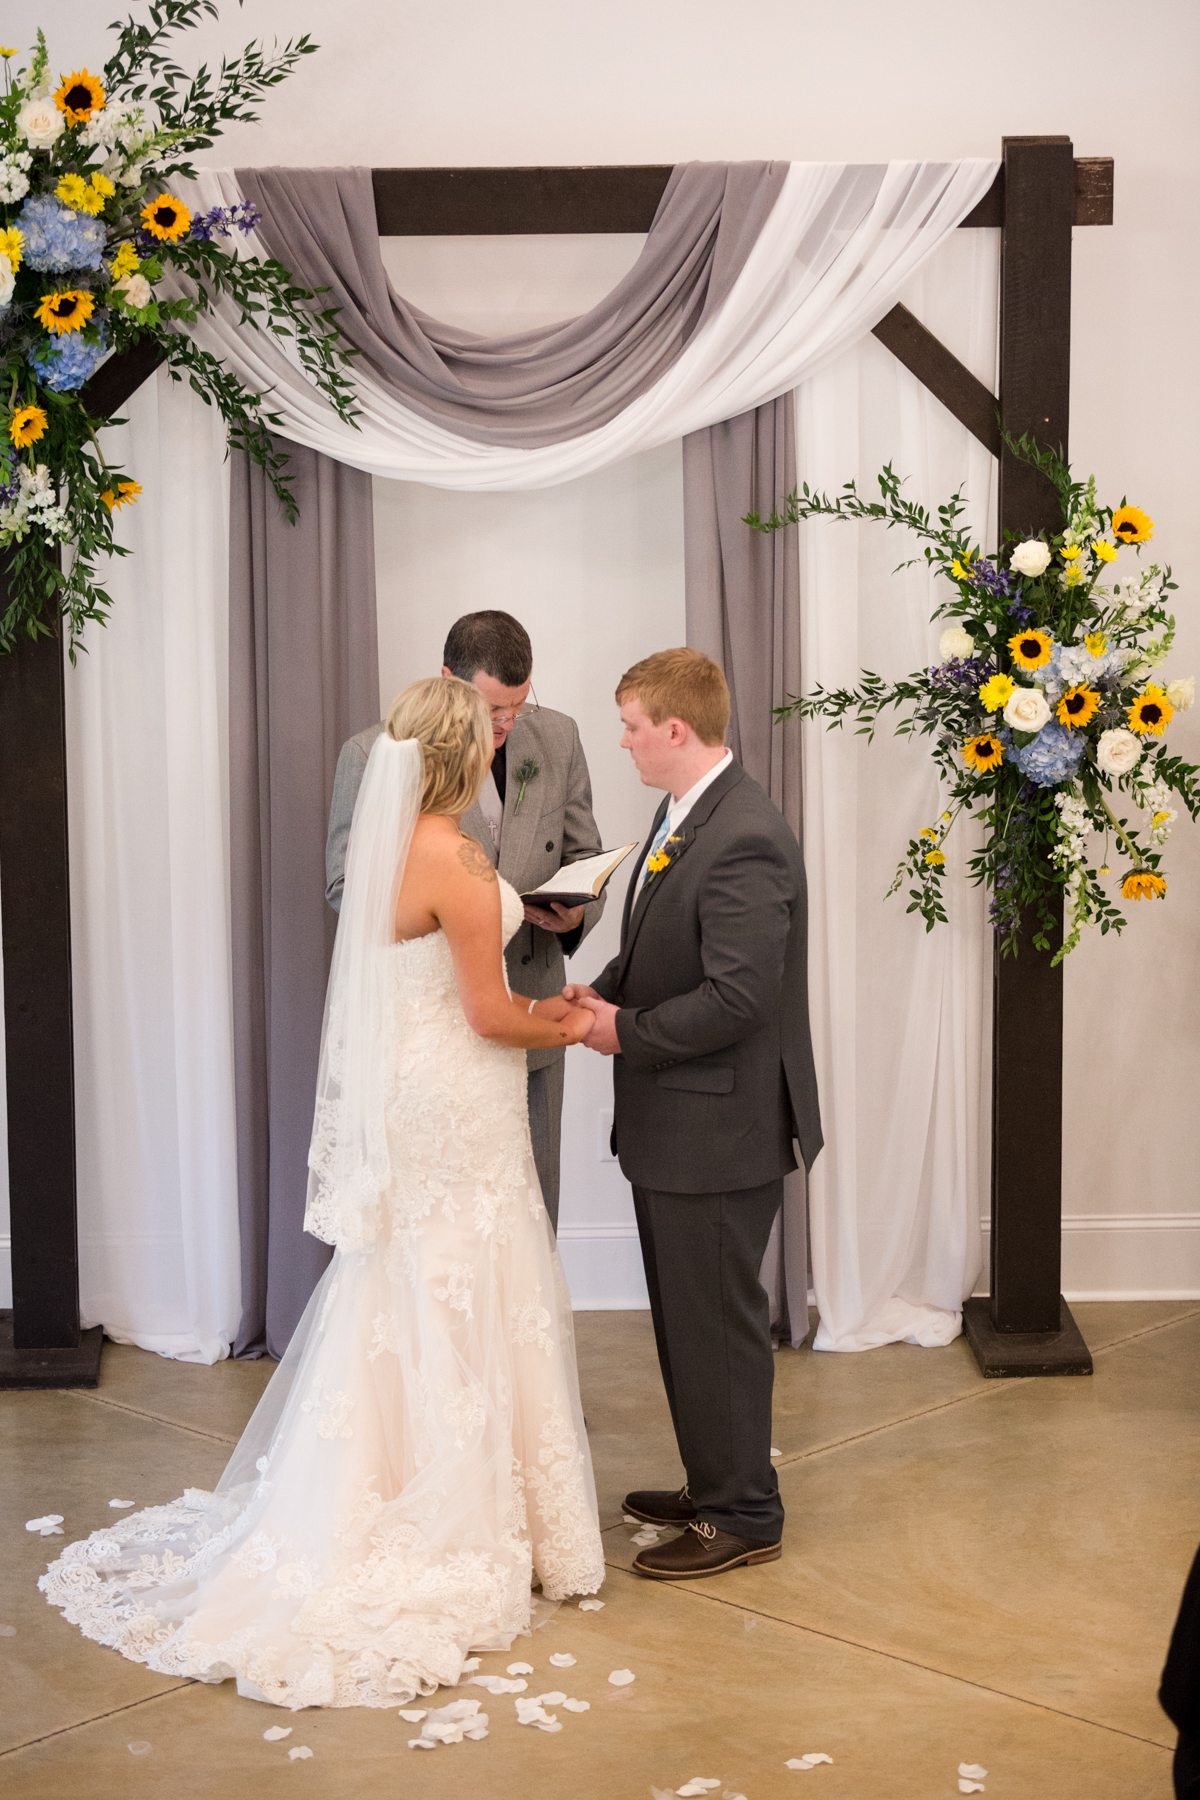 The-venue-at-white-oak-farms-wedding-nashville-wedding-photographers-0162.jpg